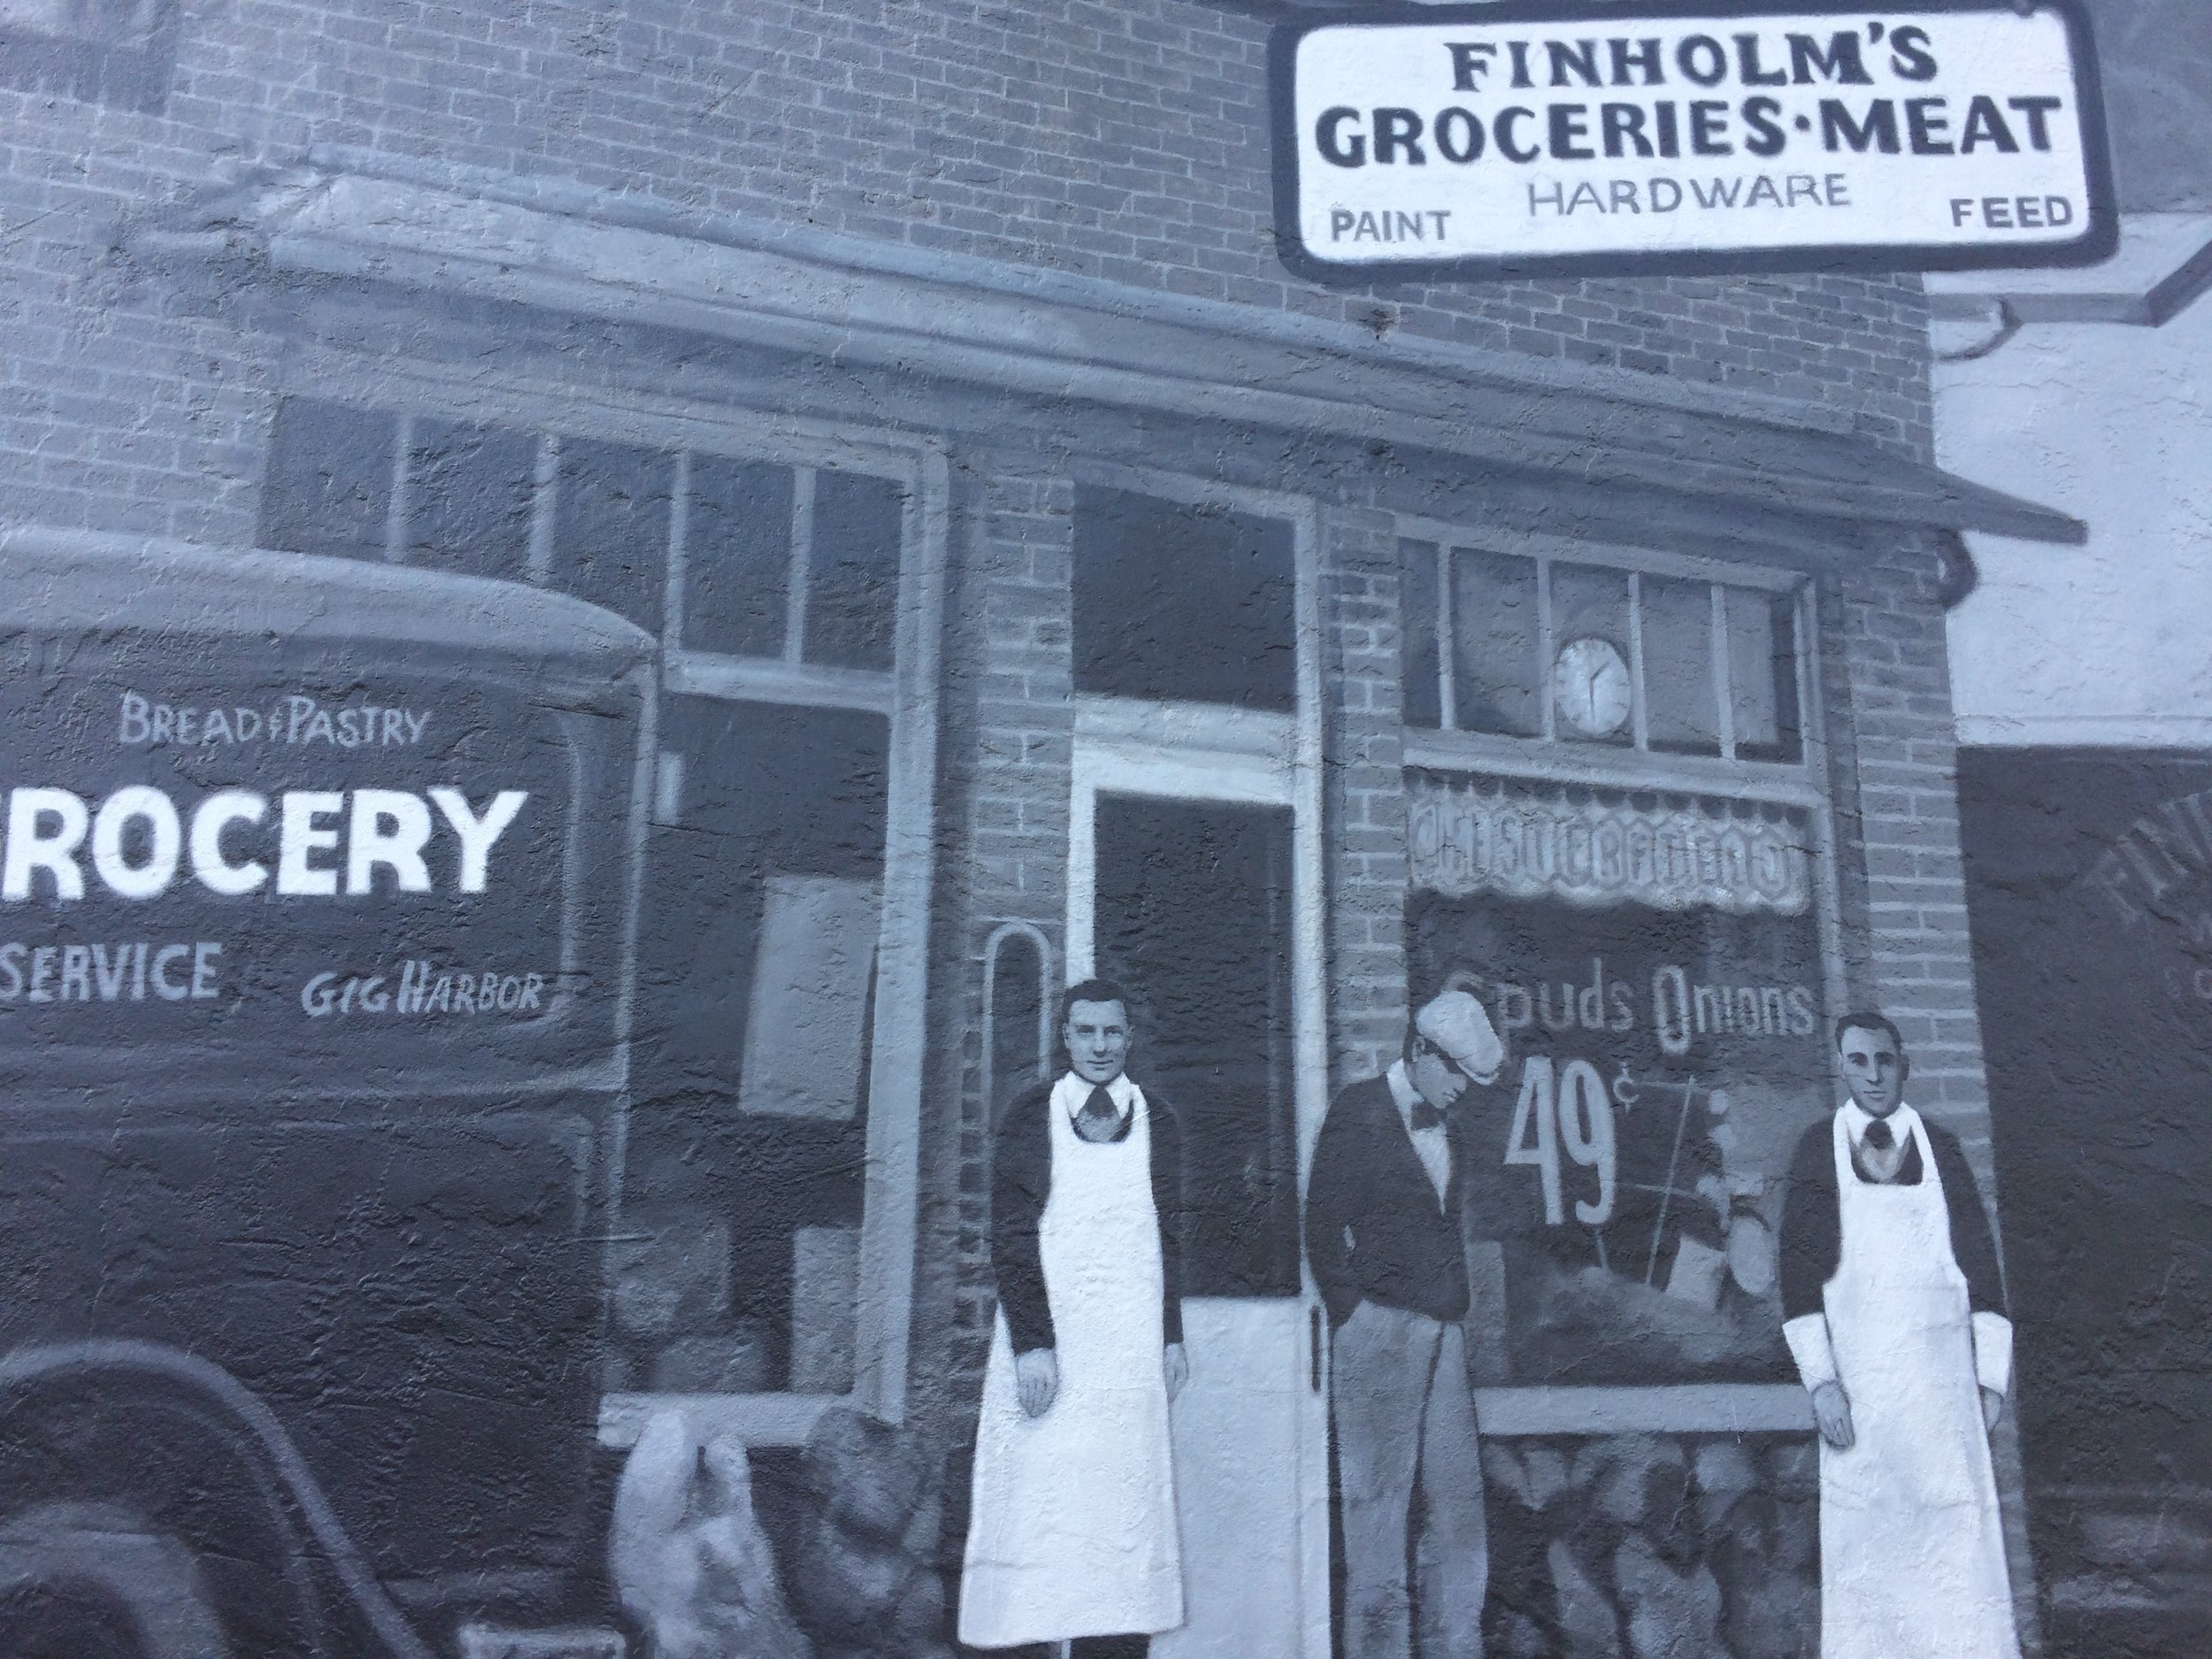 Finholm's Market and Grocery